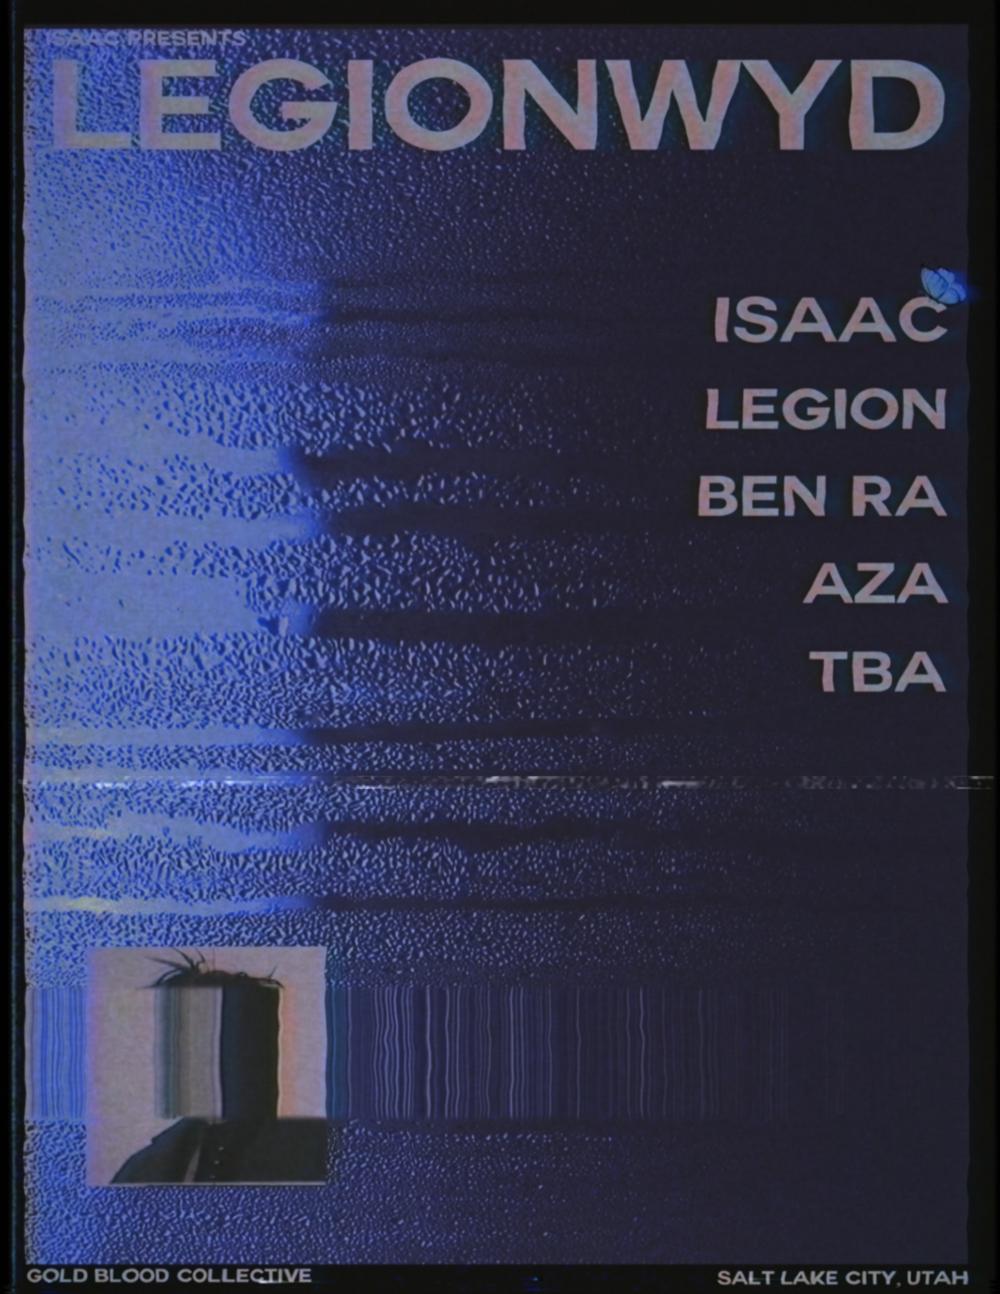 c73b813c-b936-4156-8f37-9b3777cc8f90_rw_1920(1).png